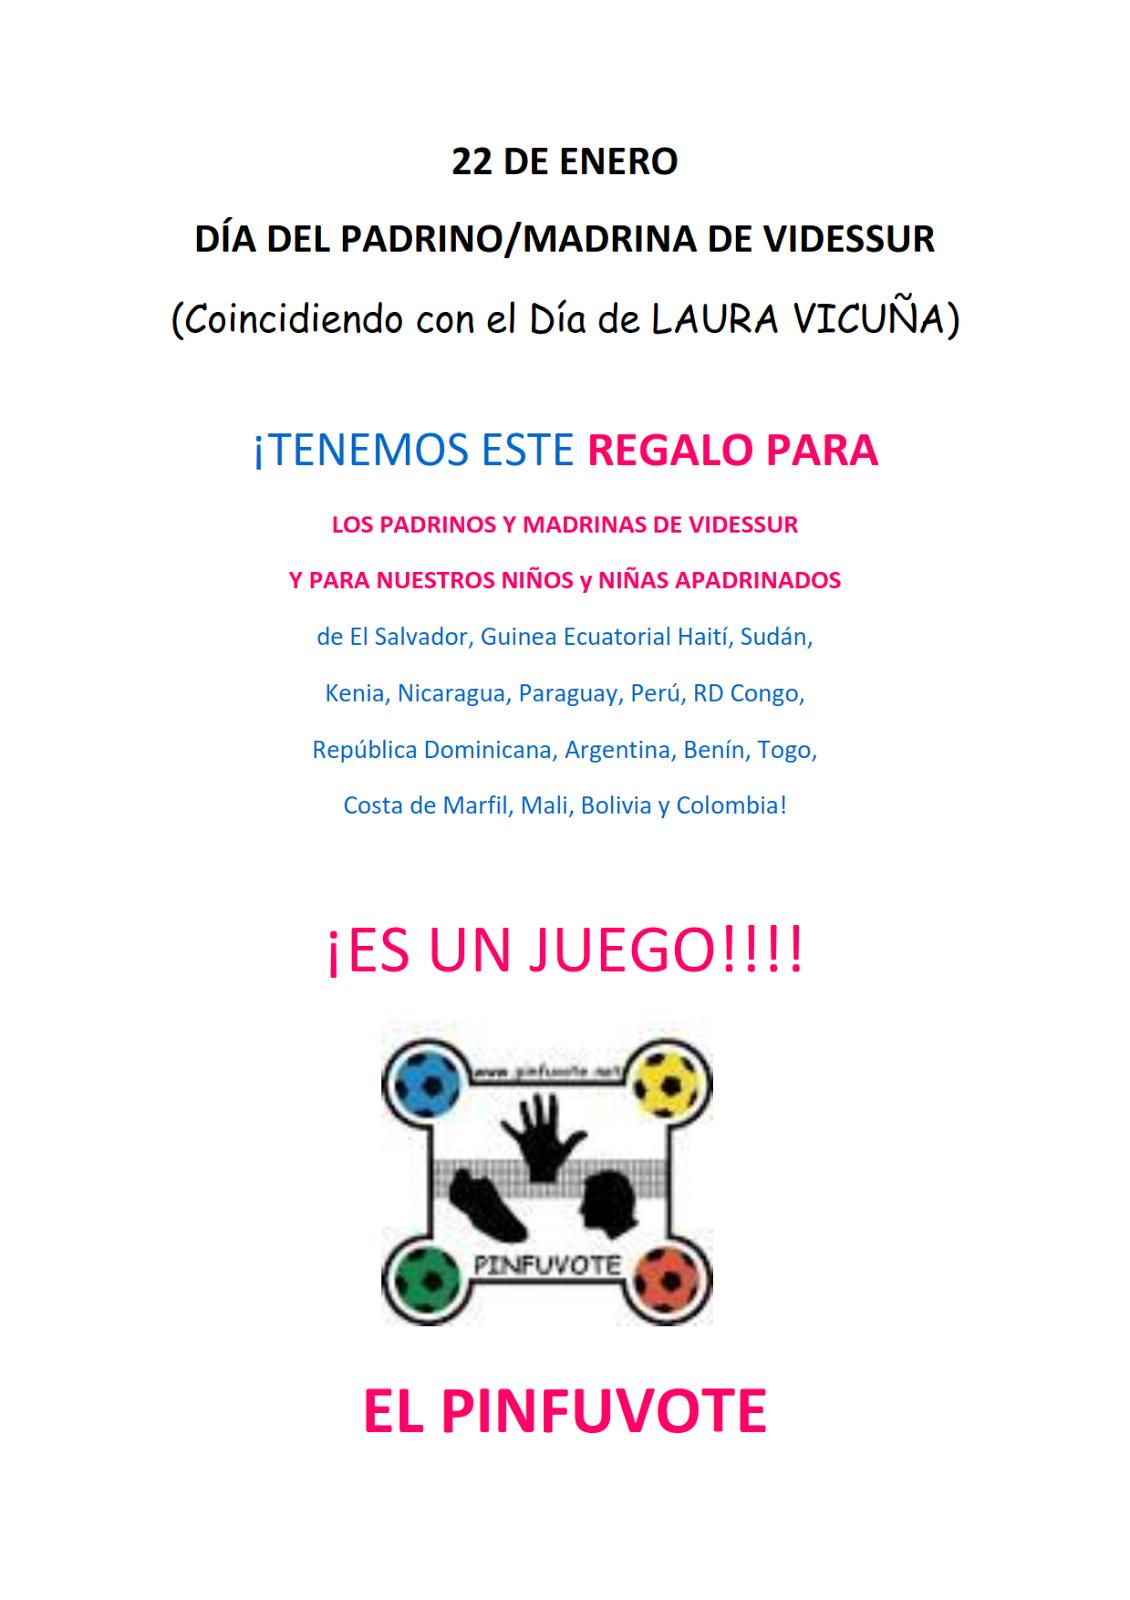 a3cbf3f664 Videssur ONGD   DIA DEL PADRINO Y MADRINA 2017